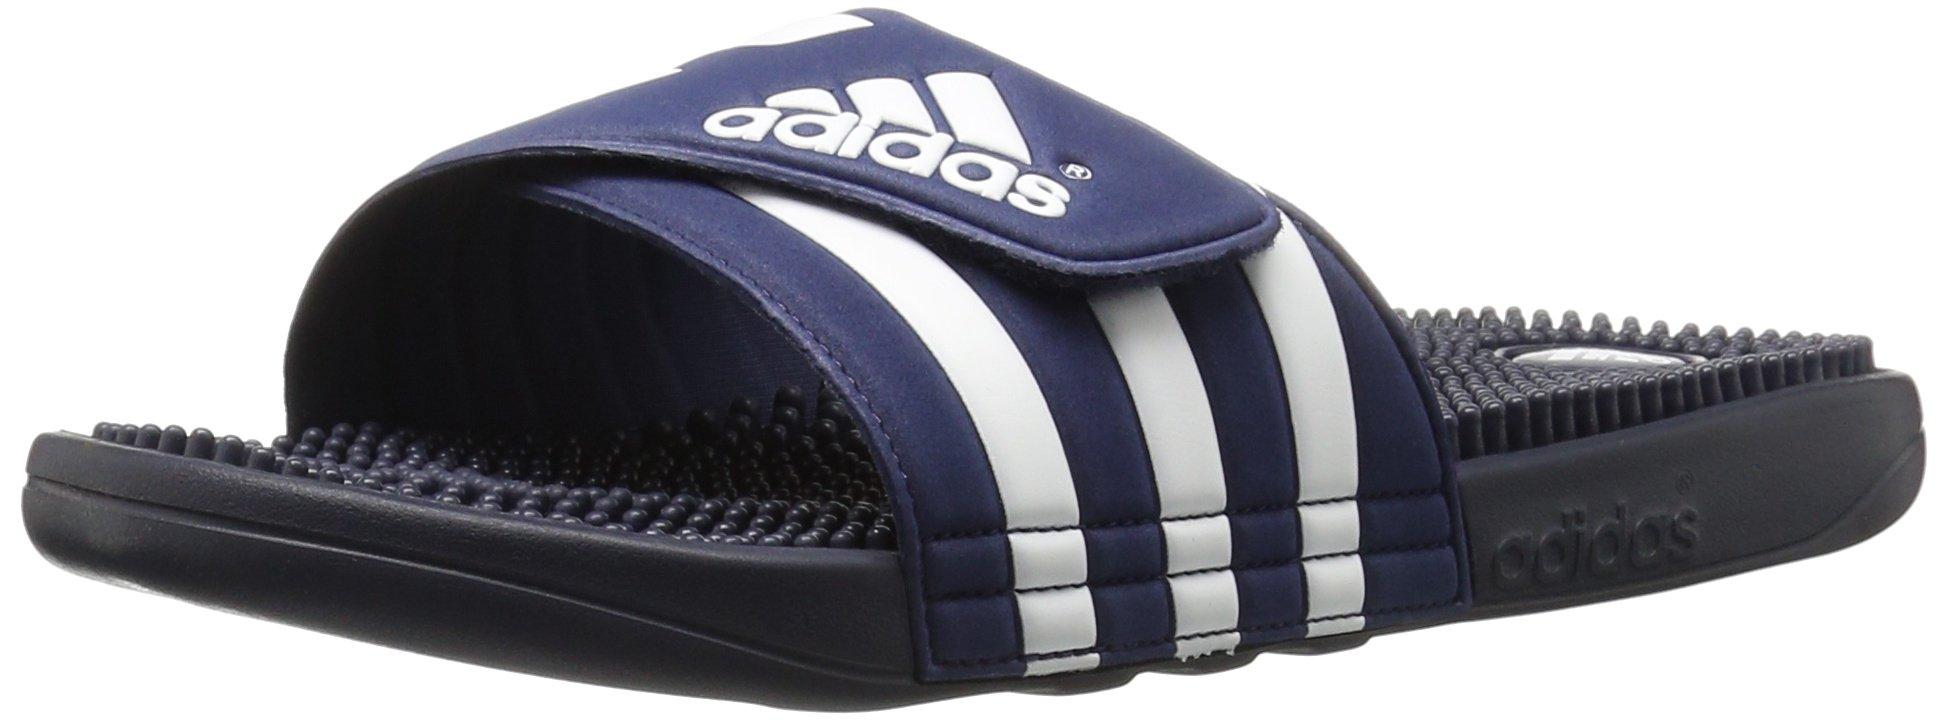 0cfe55791cf9 Cheap Adidas Adissage Slides